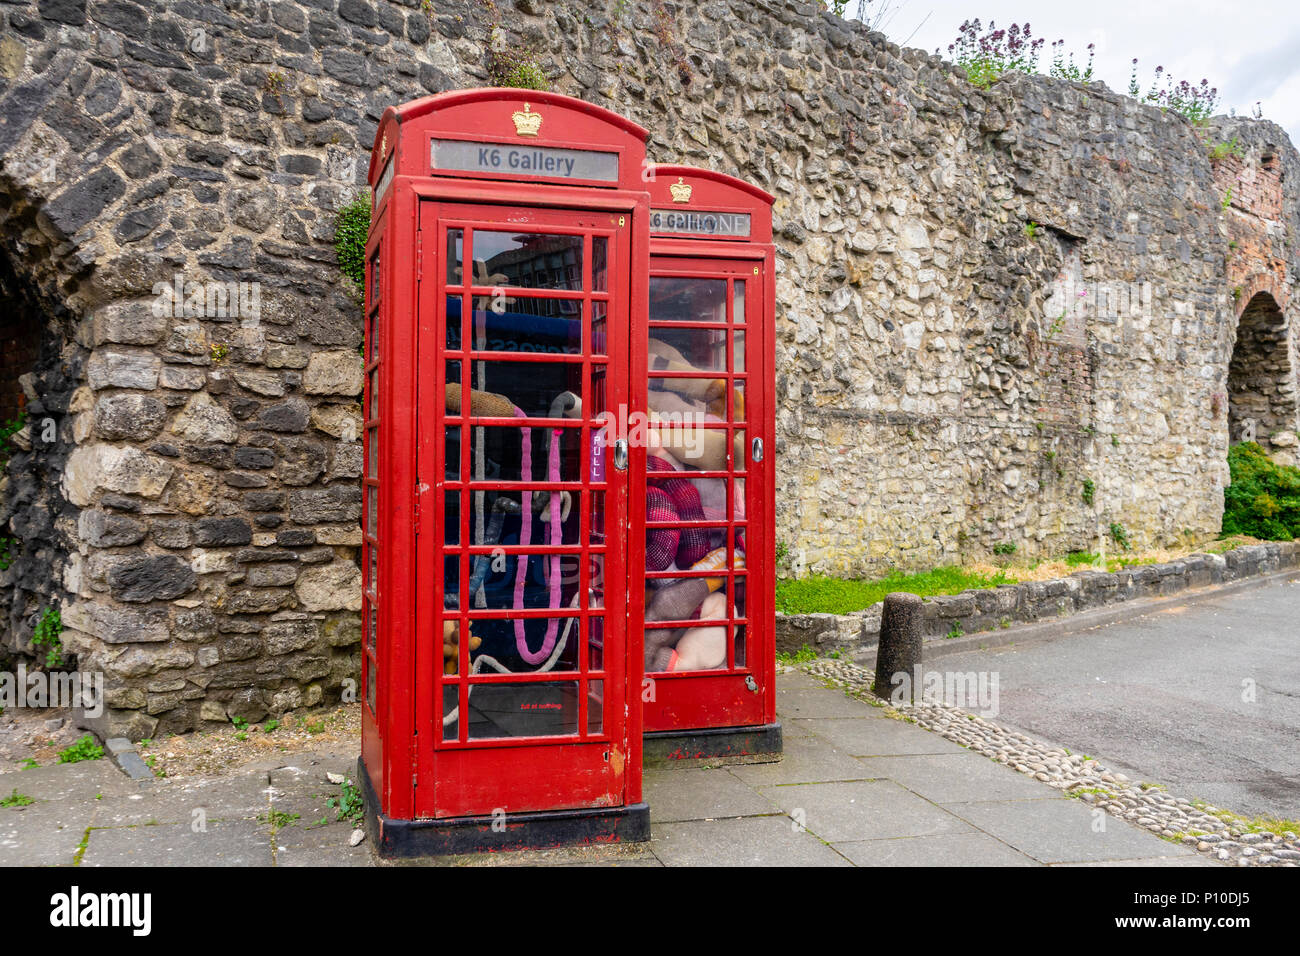 """Tuffed"" exposición en la galería de K6 en Southampton, que se exhibe en dos Grado II figuran cuadros de teléfono rojo, Southampton, Inglaterra, Reino Unido. Foto de stock"